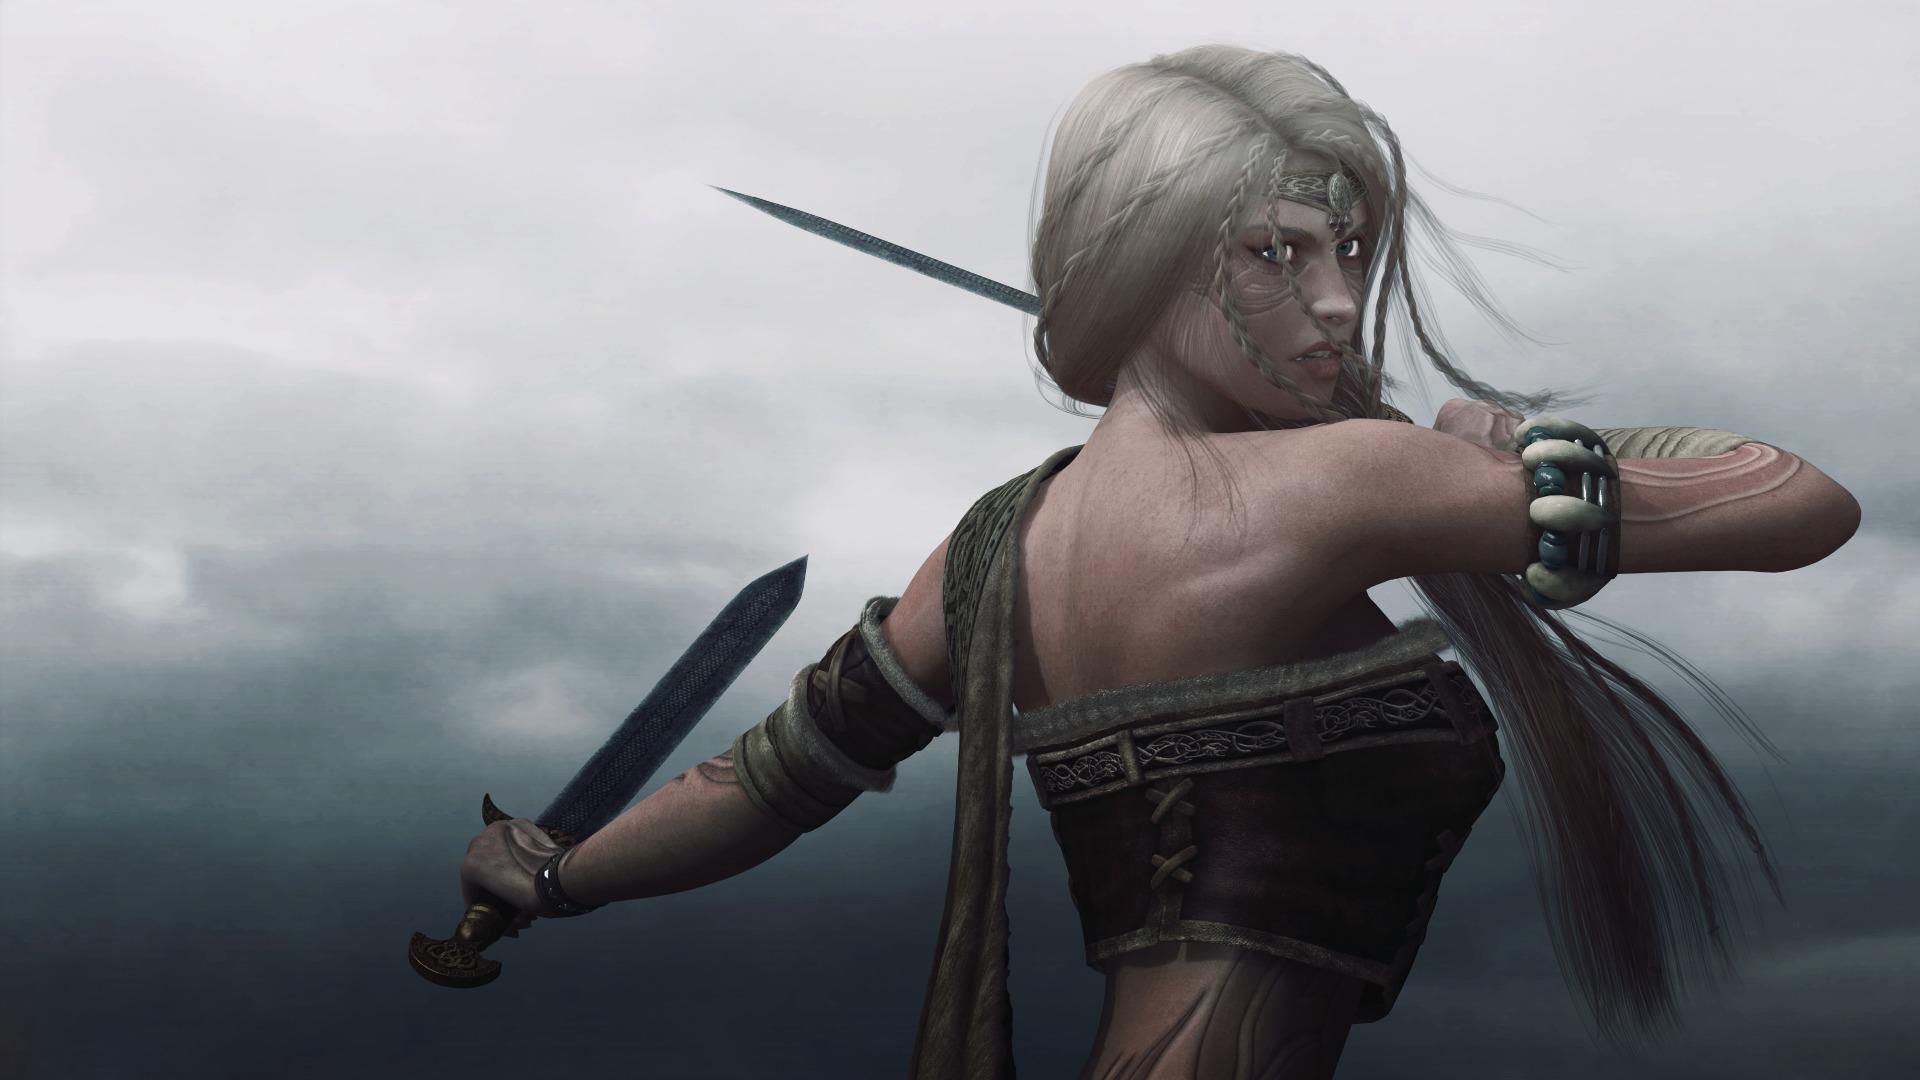 Fantasy woman warrior full hd wallpaper and background image fantasy women warrior fantasy woman girl warrior dagger wallpaper voltagebd Images